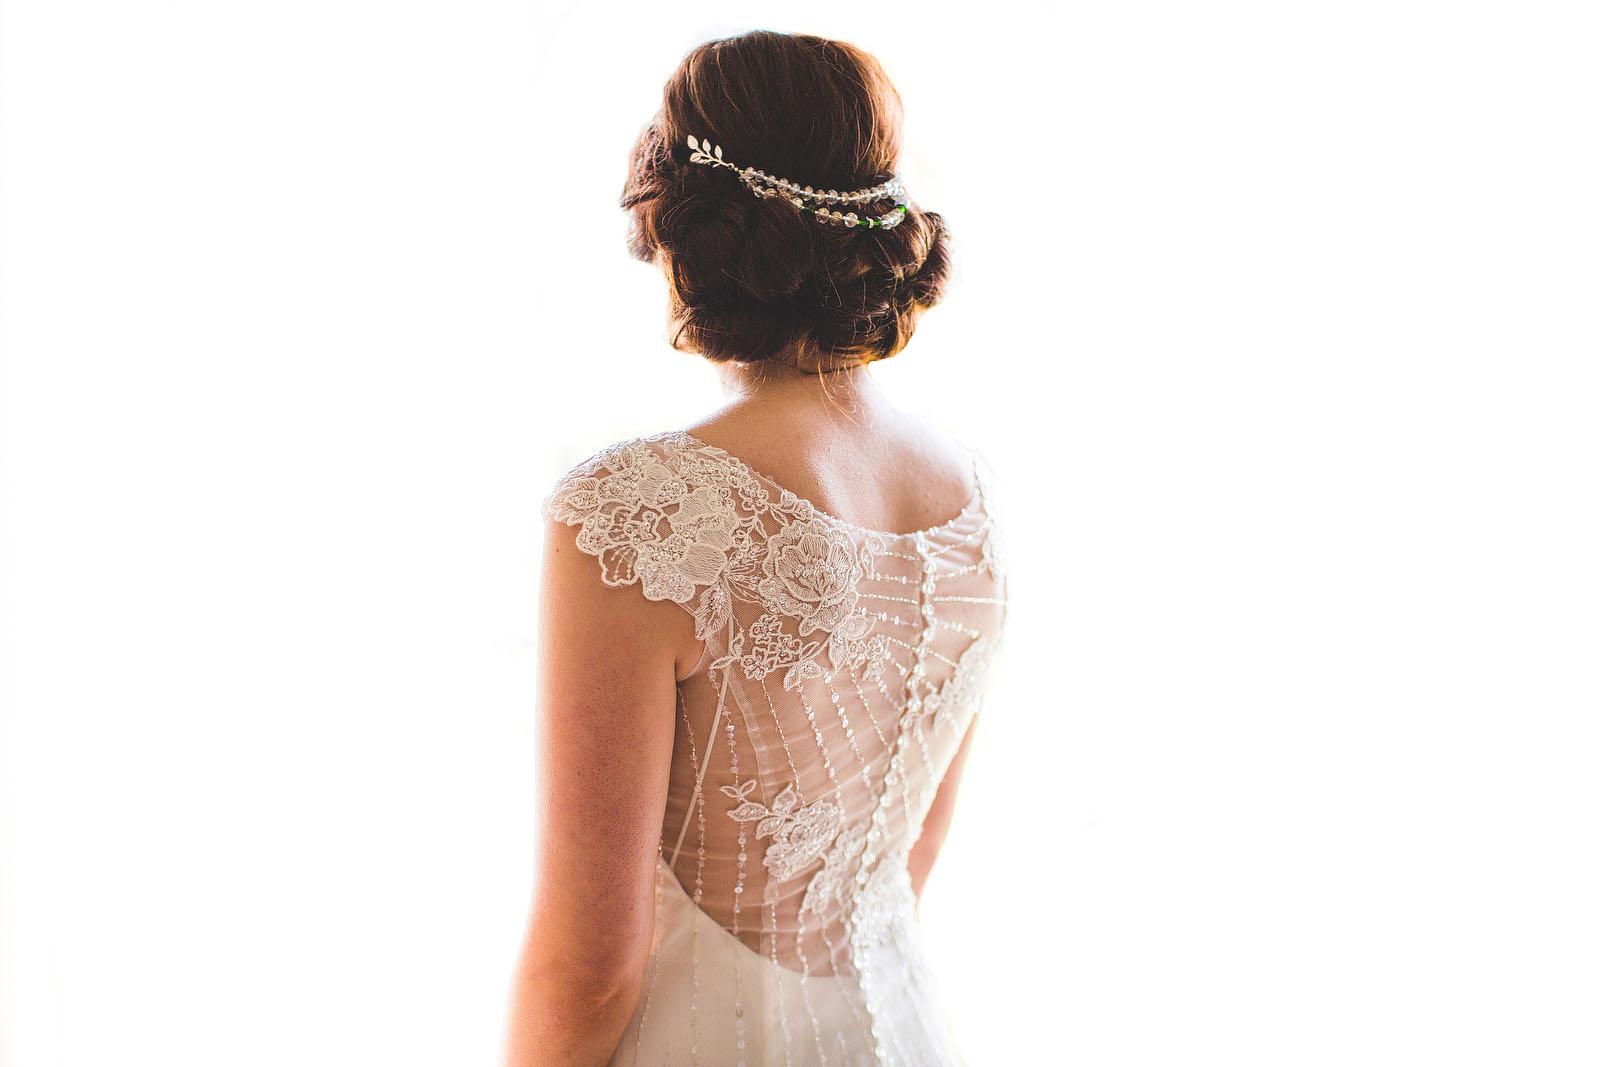 A Maggie Sotterro dress1